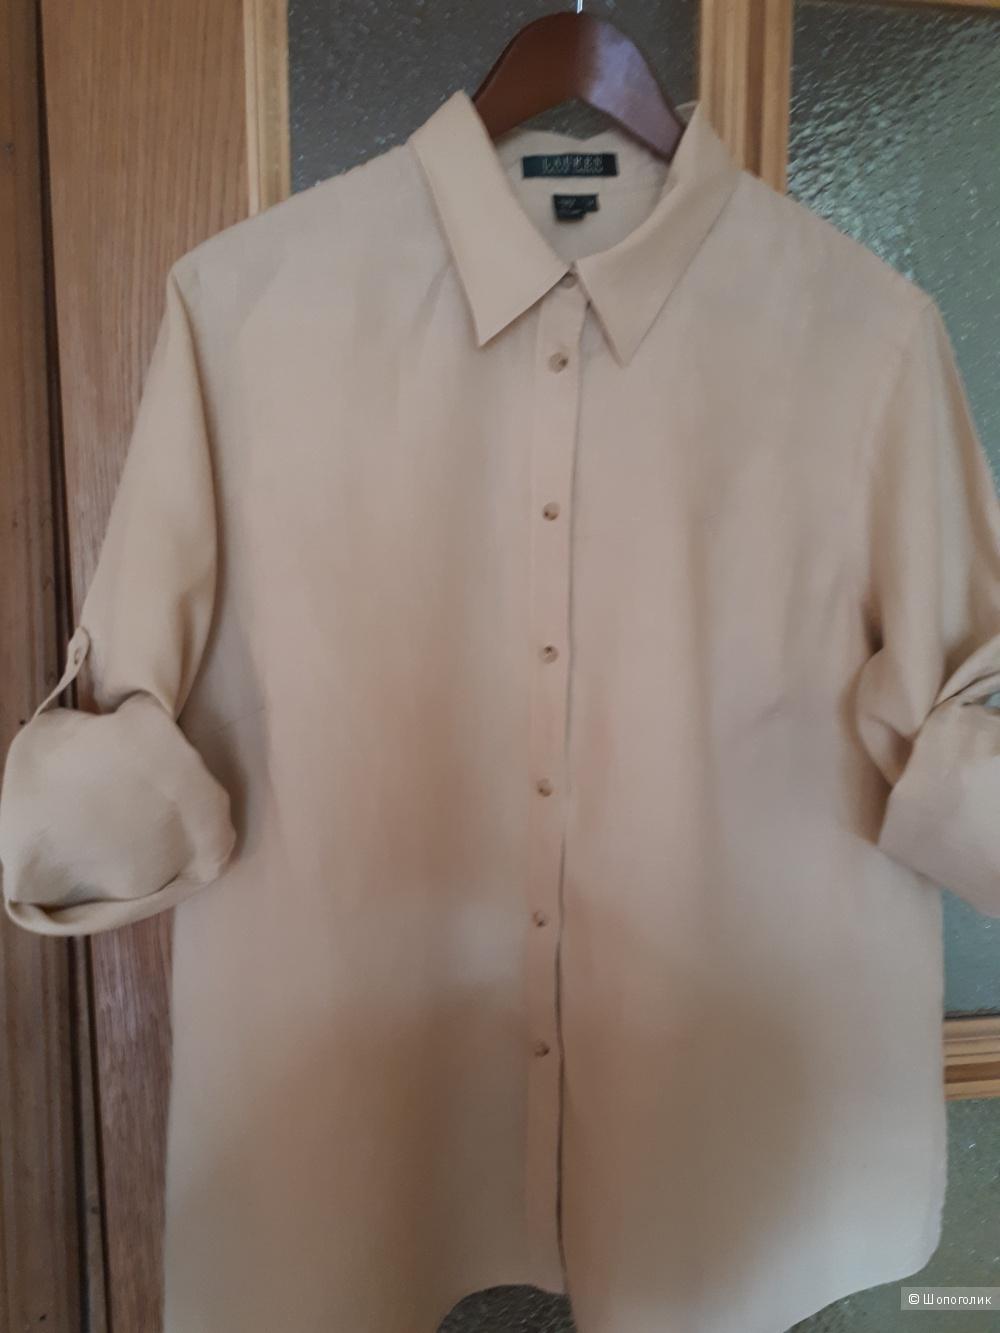 93de1fc4d14 Рубашка 100% лен RALPH LAUREN размер 1X